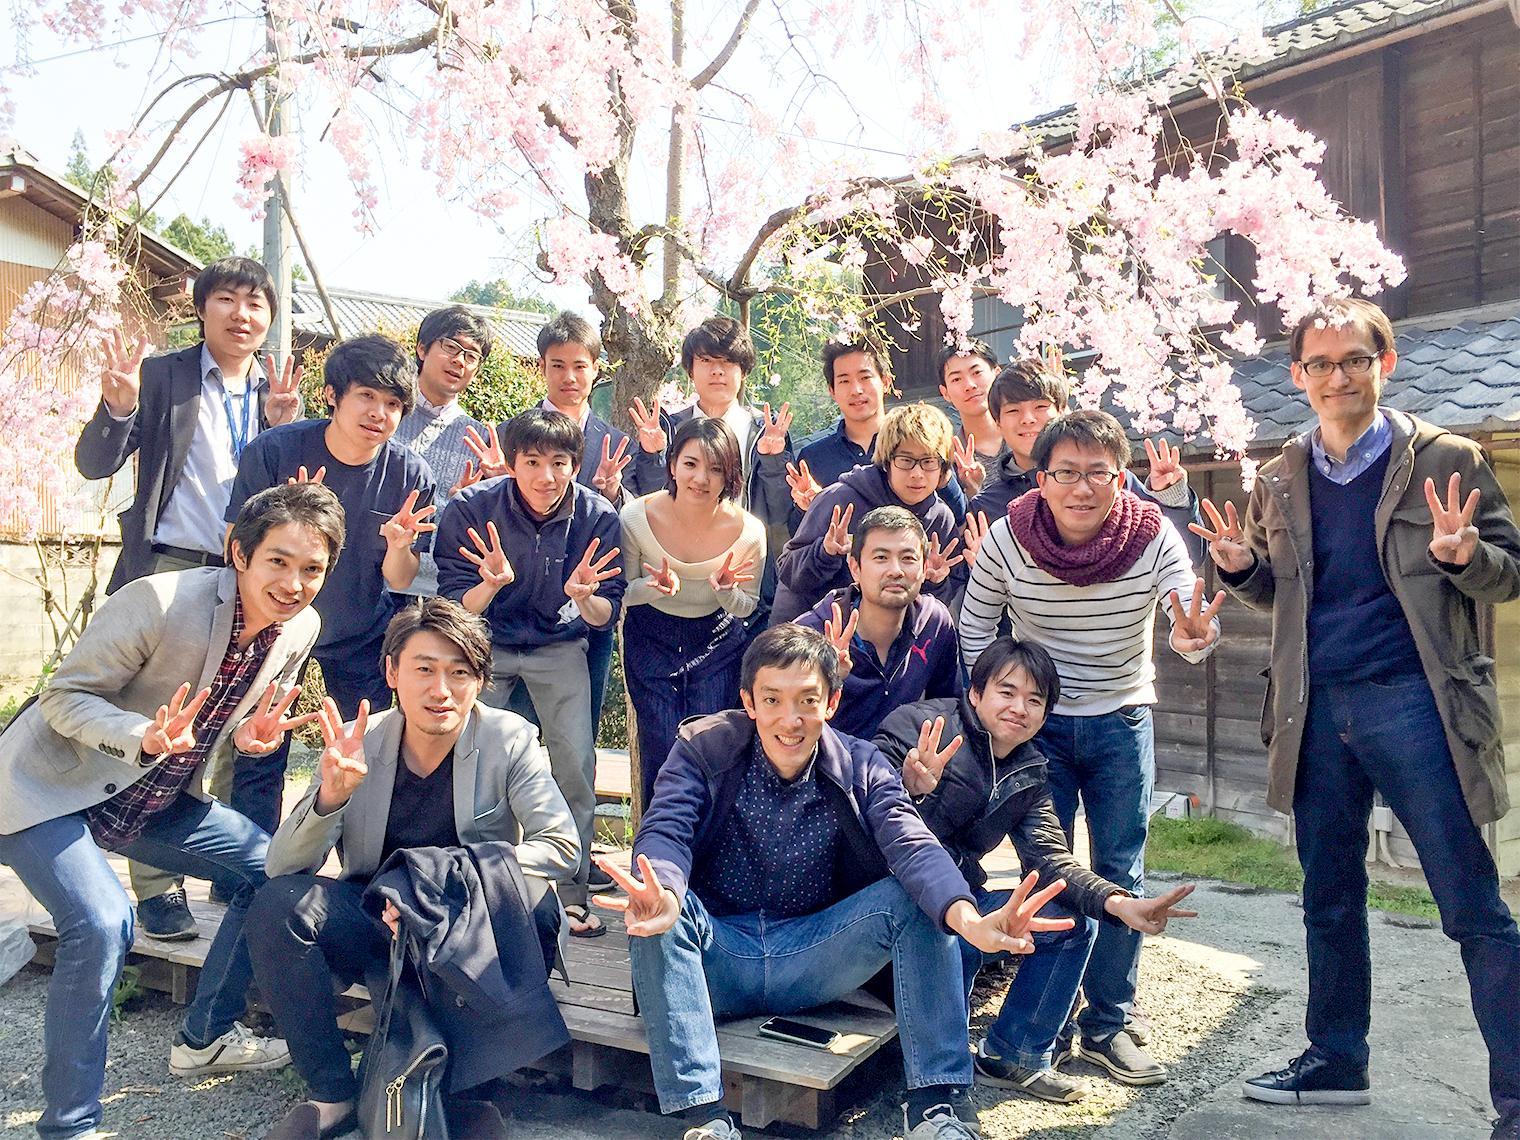 Sansan神山ラボは新卒研修にも使われています。